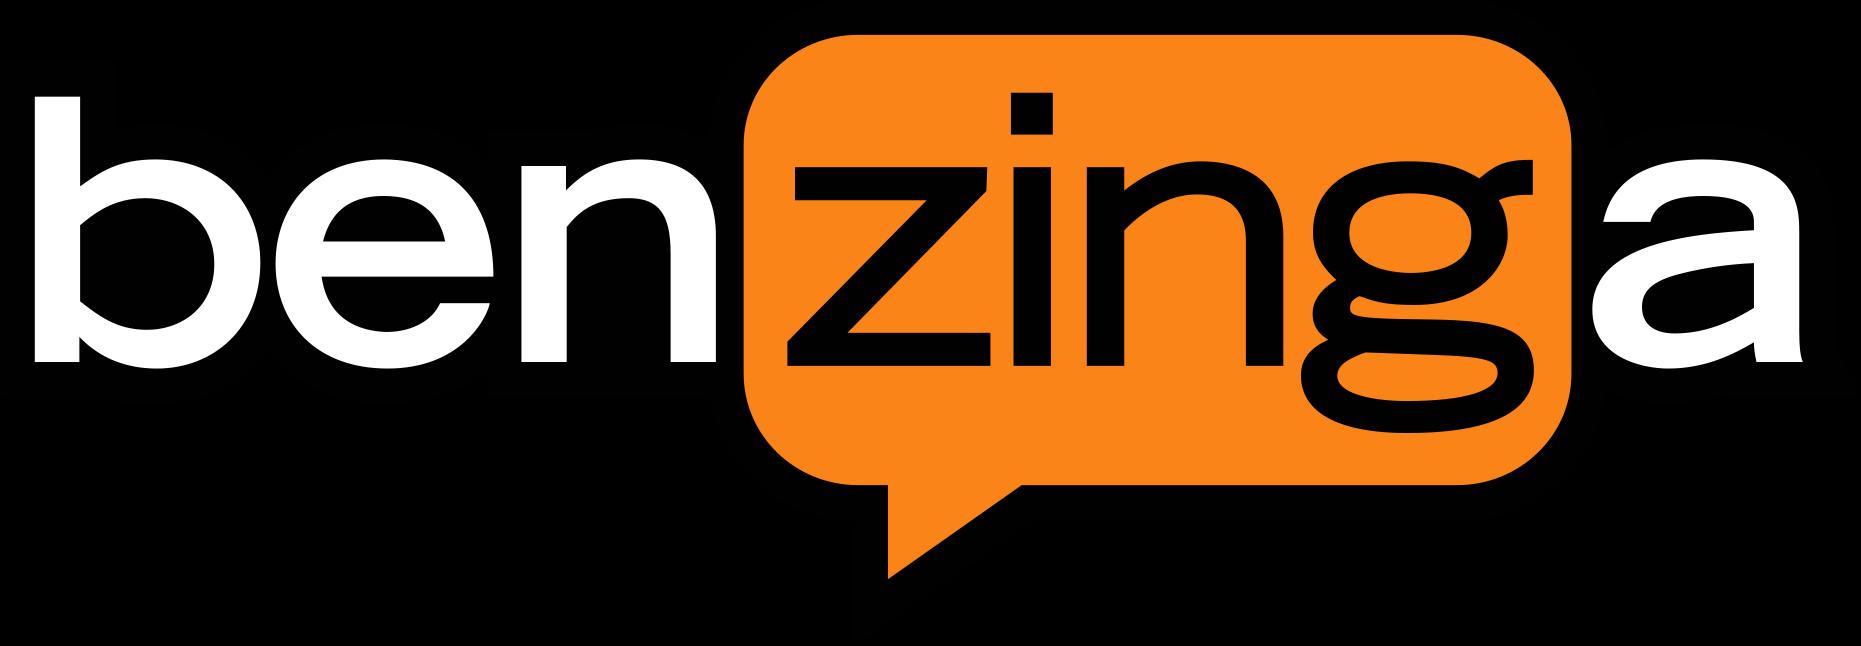 420MEDIA and Benzinga